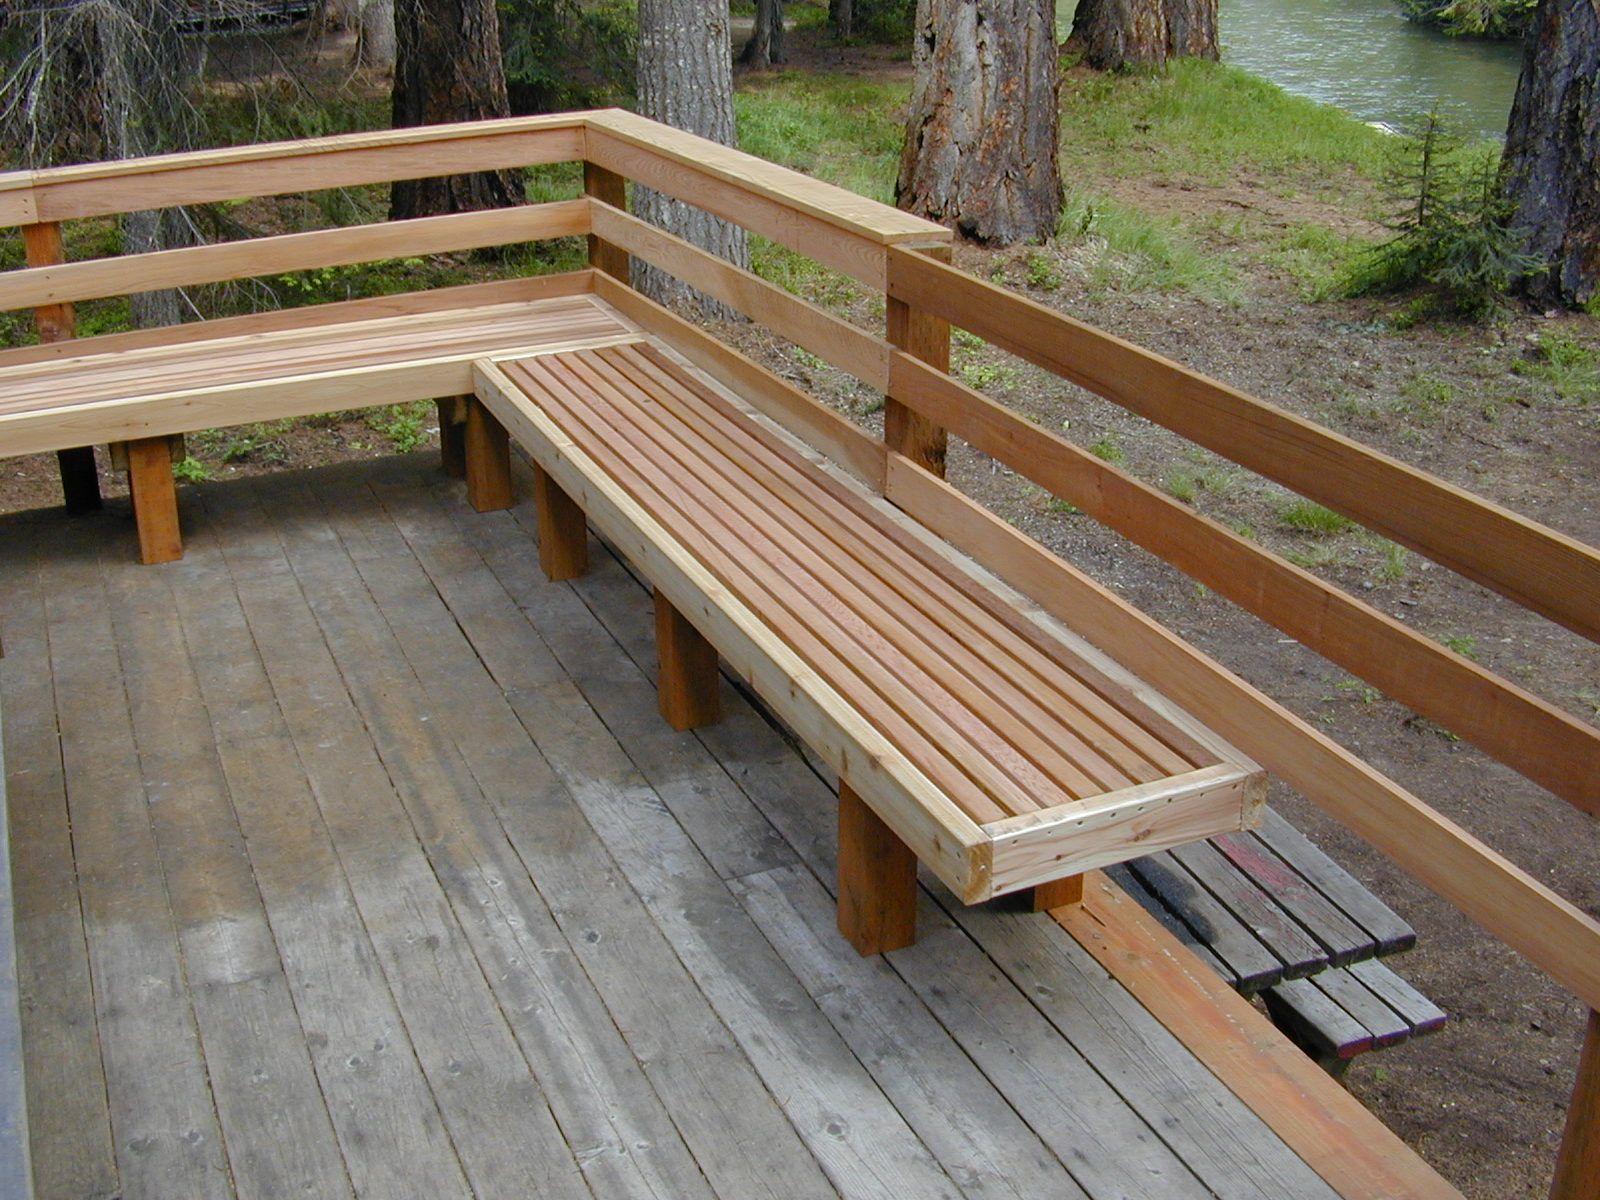 Deck bench railing visit more deck railing ideas http for Outdoor deck plans